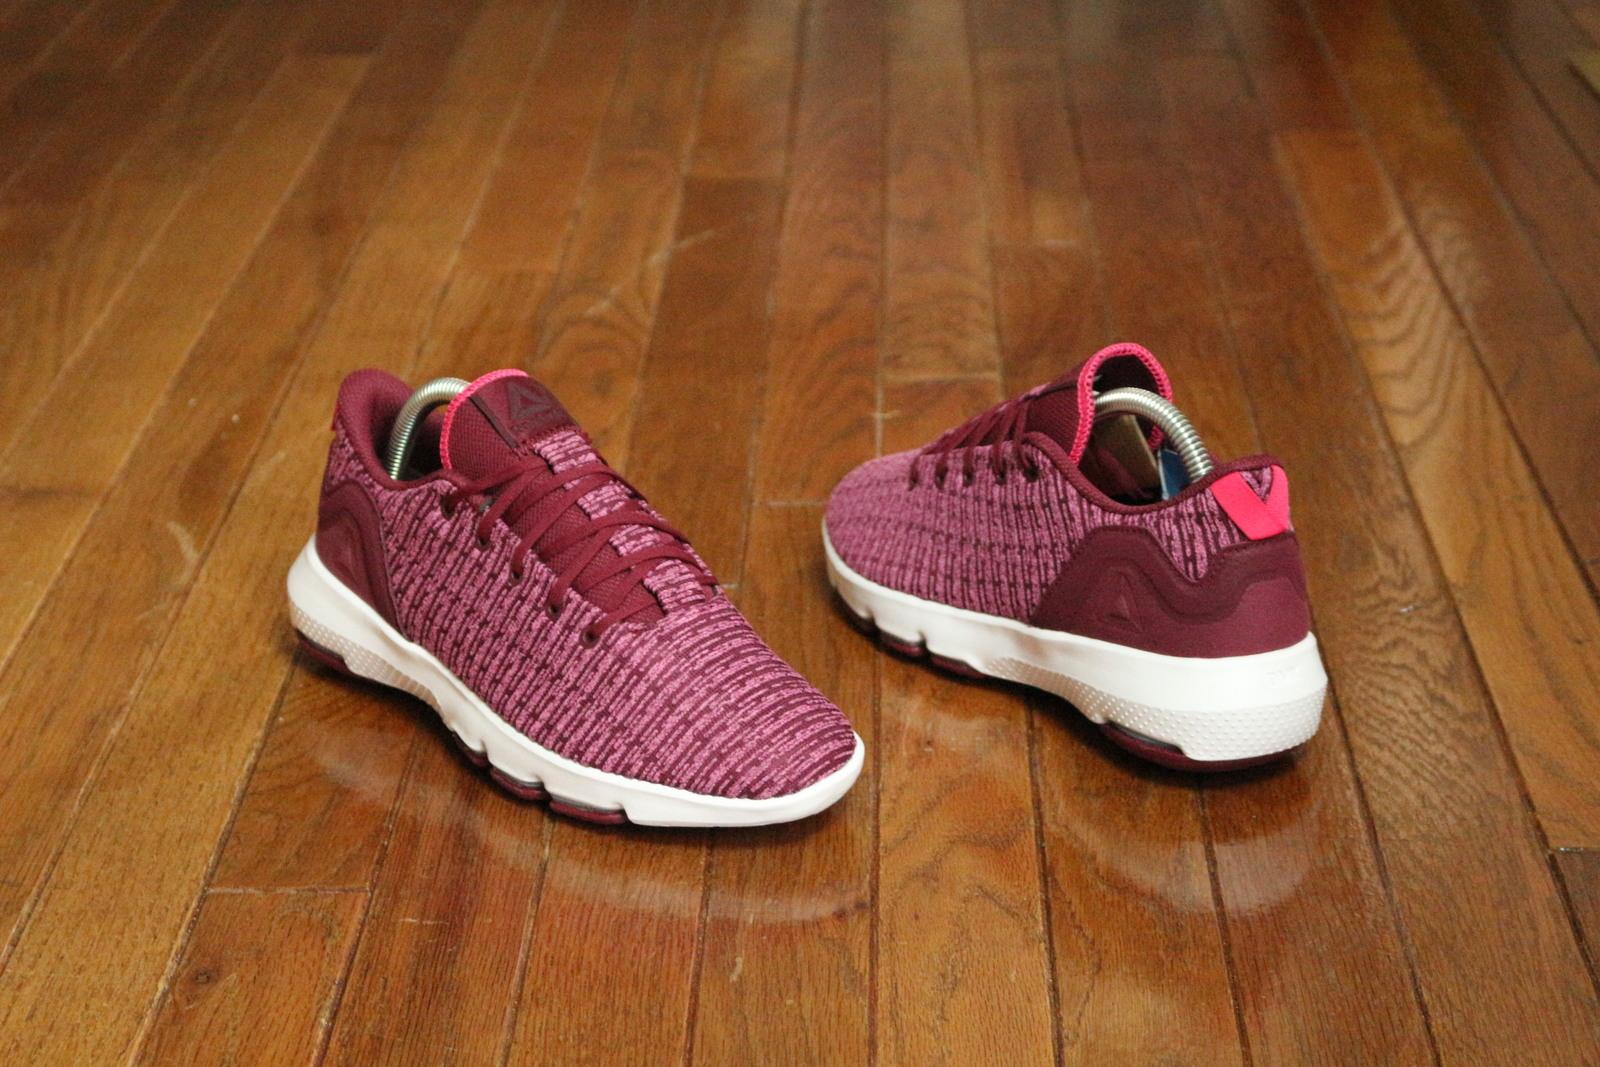 6b8f2c568559c5 Reebok Women s Size 8 Cloudride DMX 3.0 Walking Shoe CN5232 TWISTED PINK